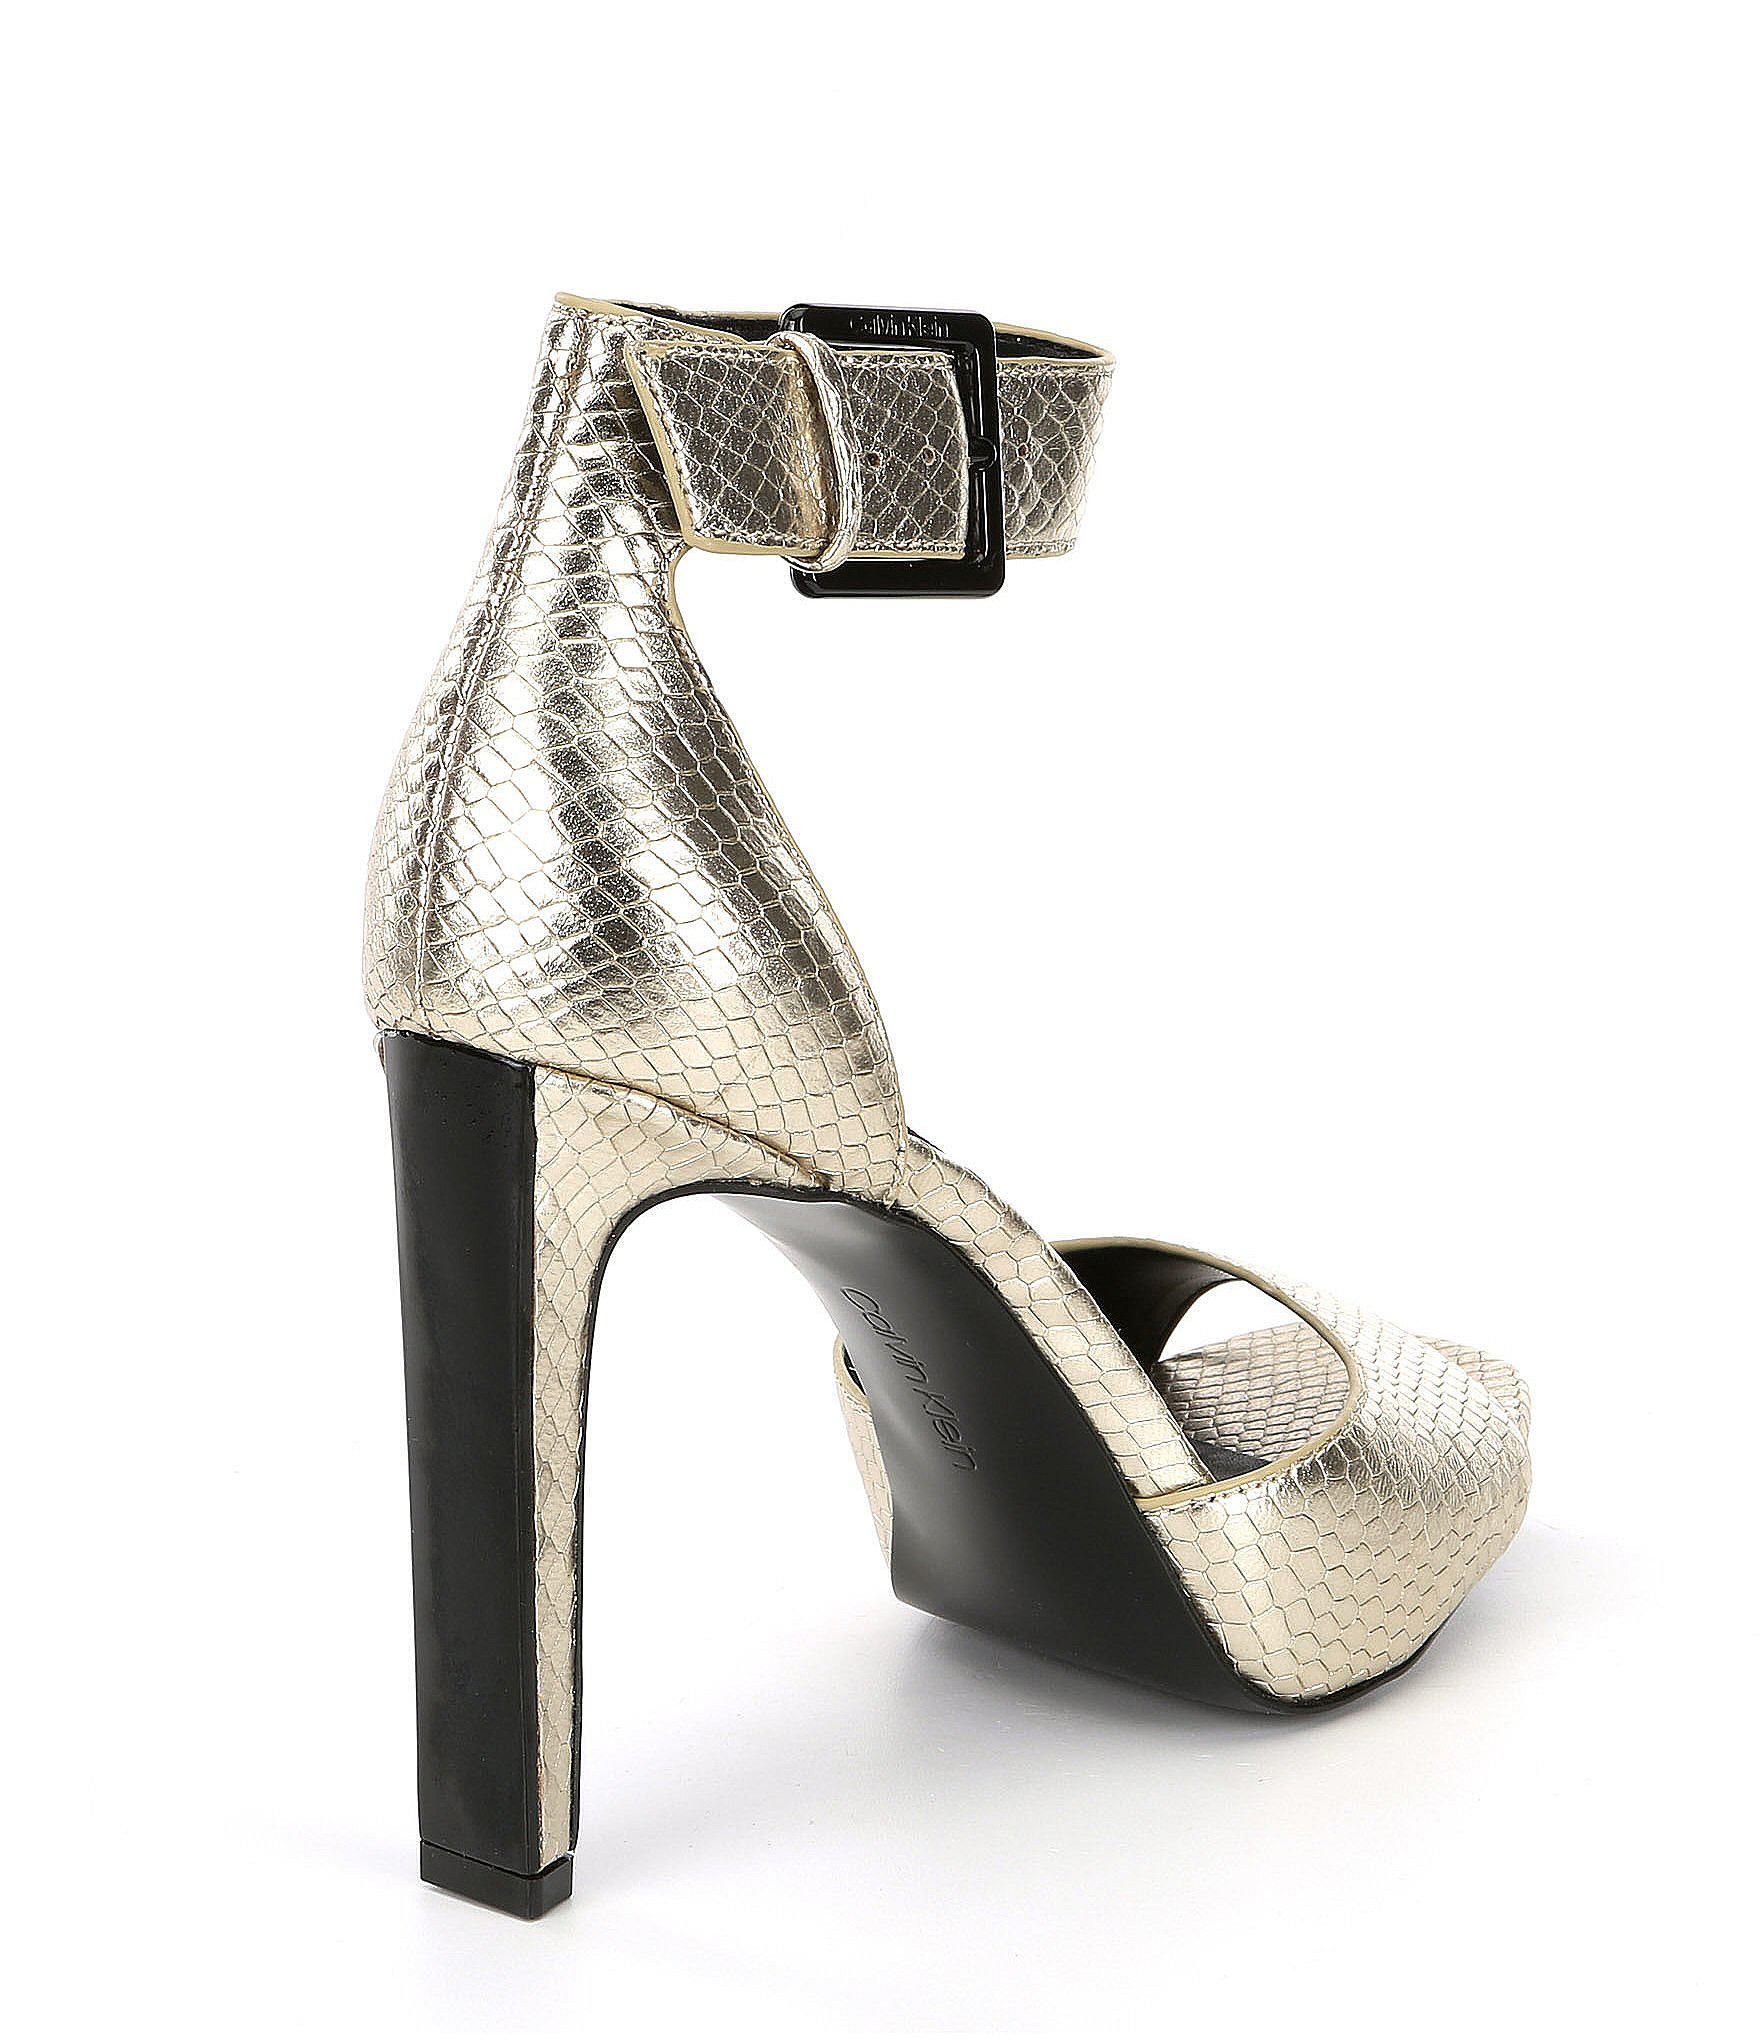 e1bd74e172d Lyst - Calvin Klein Marinda Metallic Snake Print Leather Dress ...